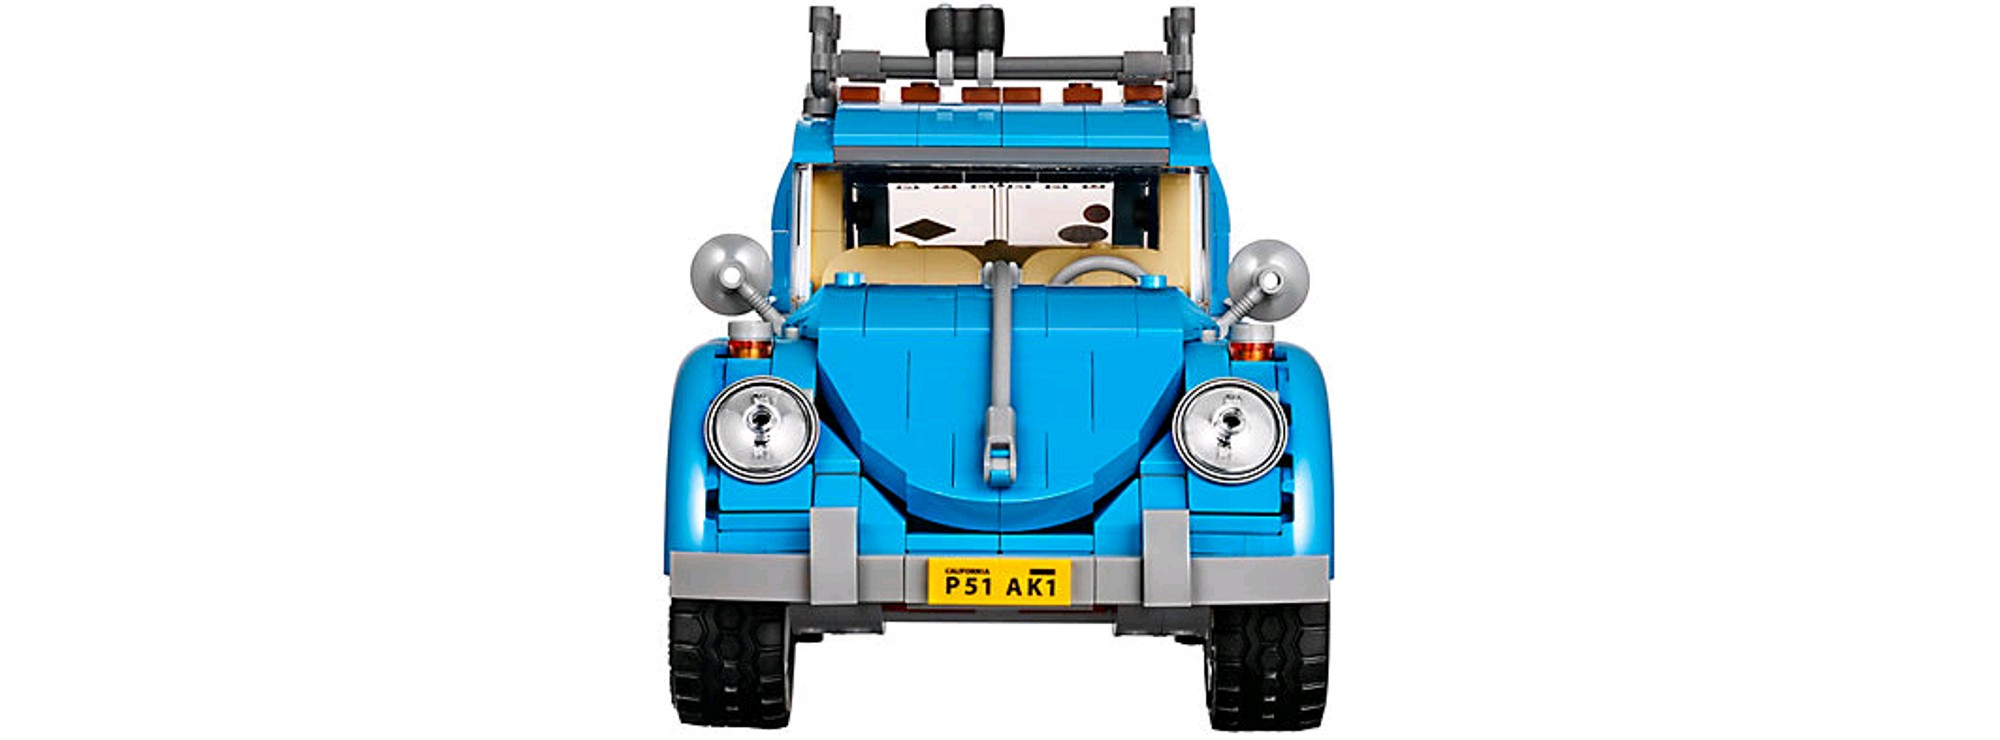 Lego 10252 Vw Kafer Lego Creator Online Kaufen Bei Modellbau Hartle